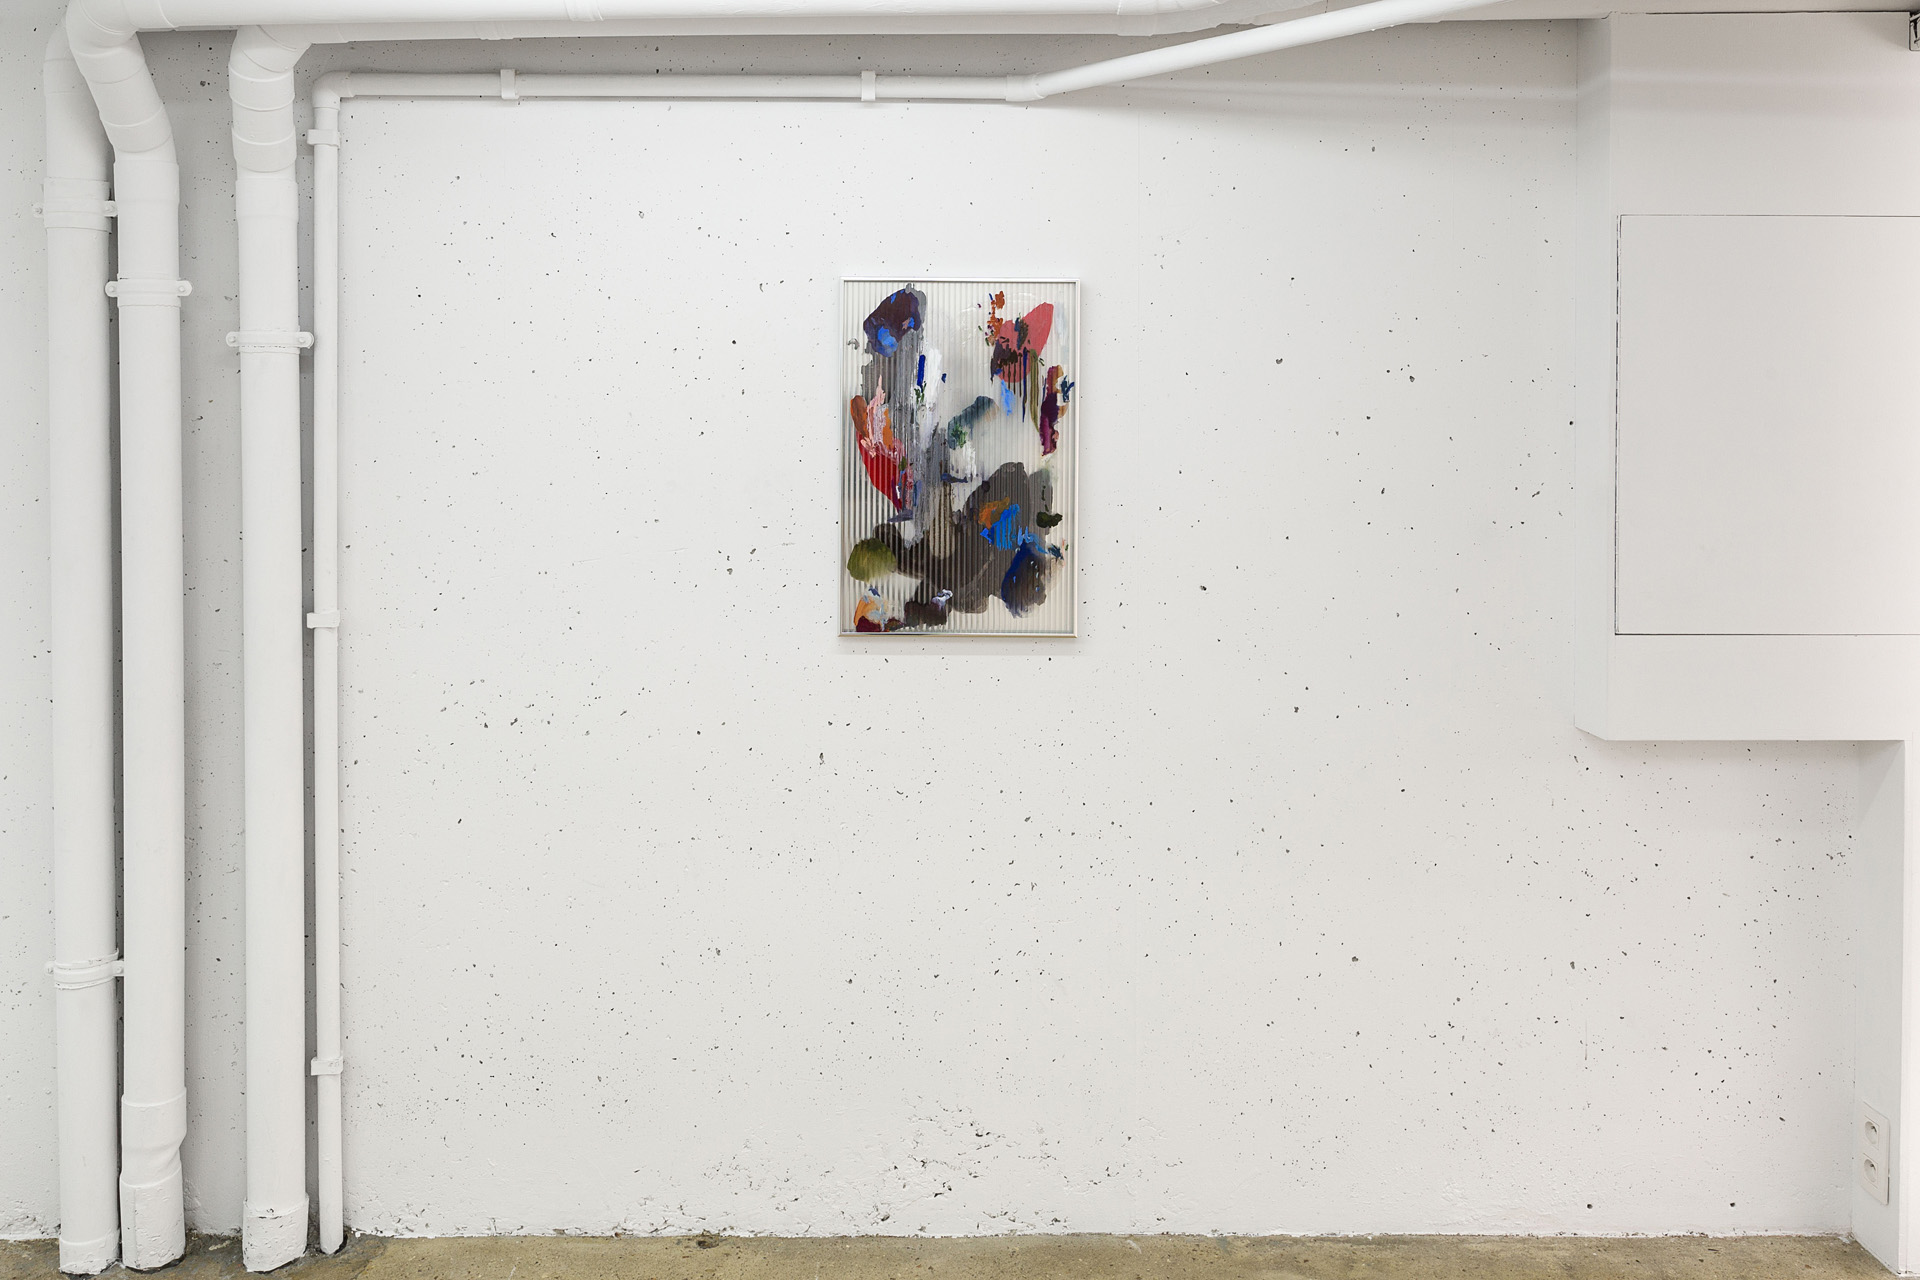 Chaos 2 , 2017 gouache, ink, acrylic, oil, mastic on polycarbonate, mirror, aluminium frame 67 x 44,5 x 2,5 cm  photo © Romain Darnaud